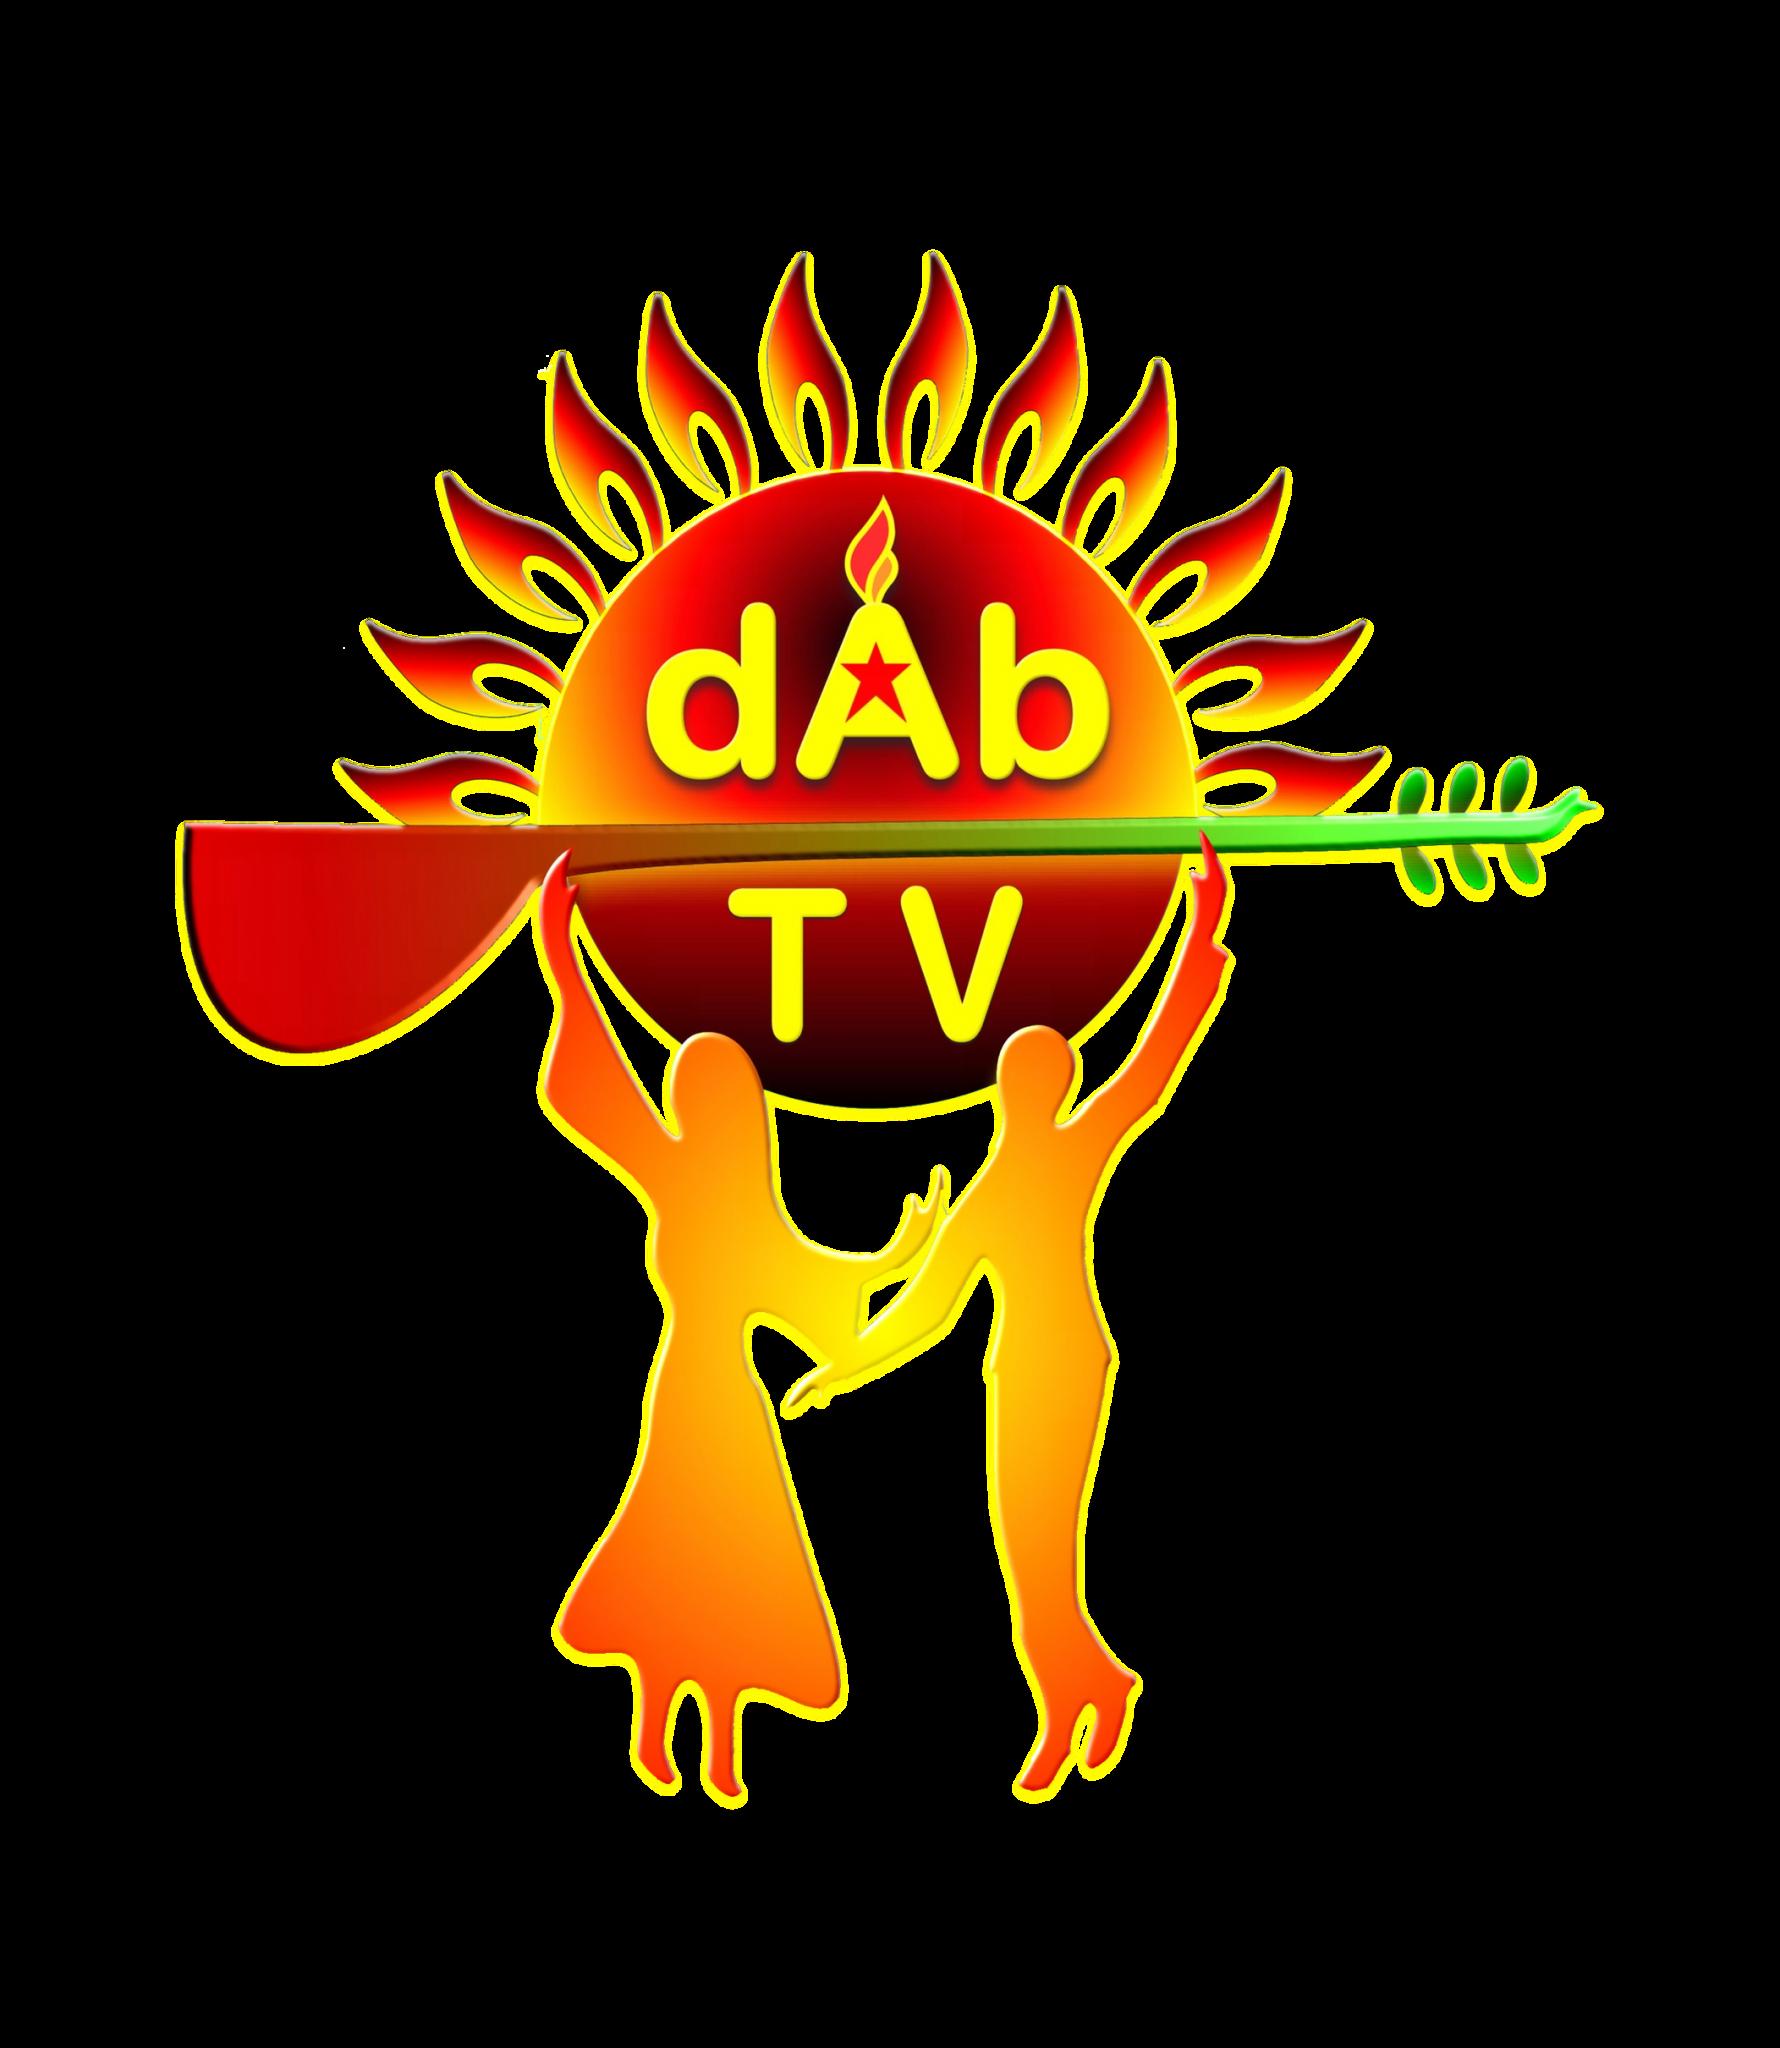 DAB Tv logo png xxxx copy 1